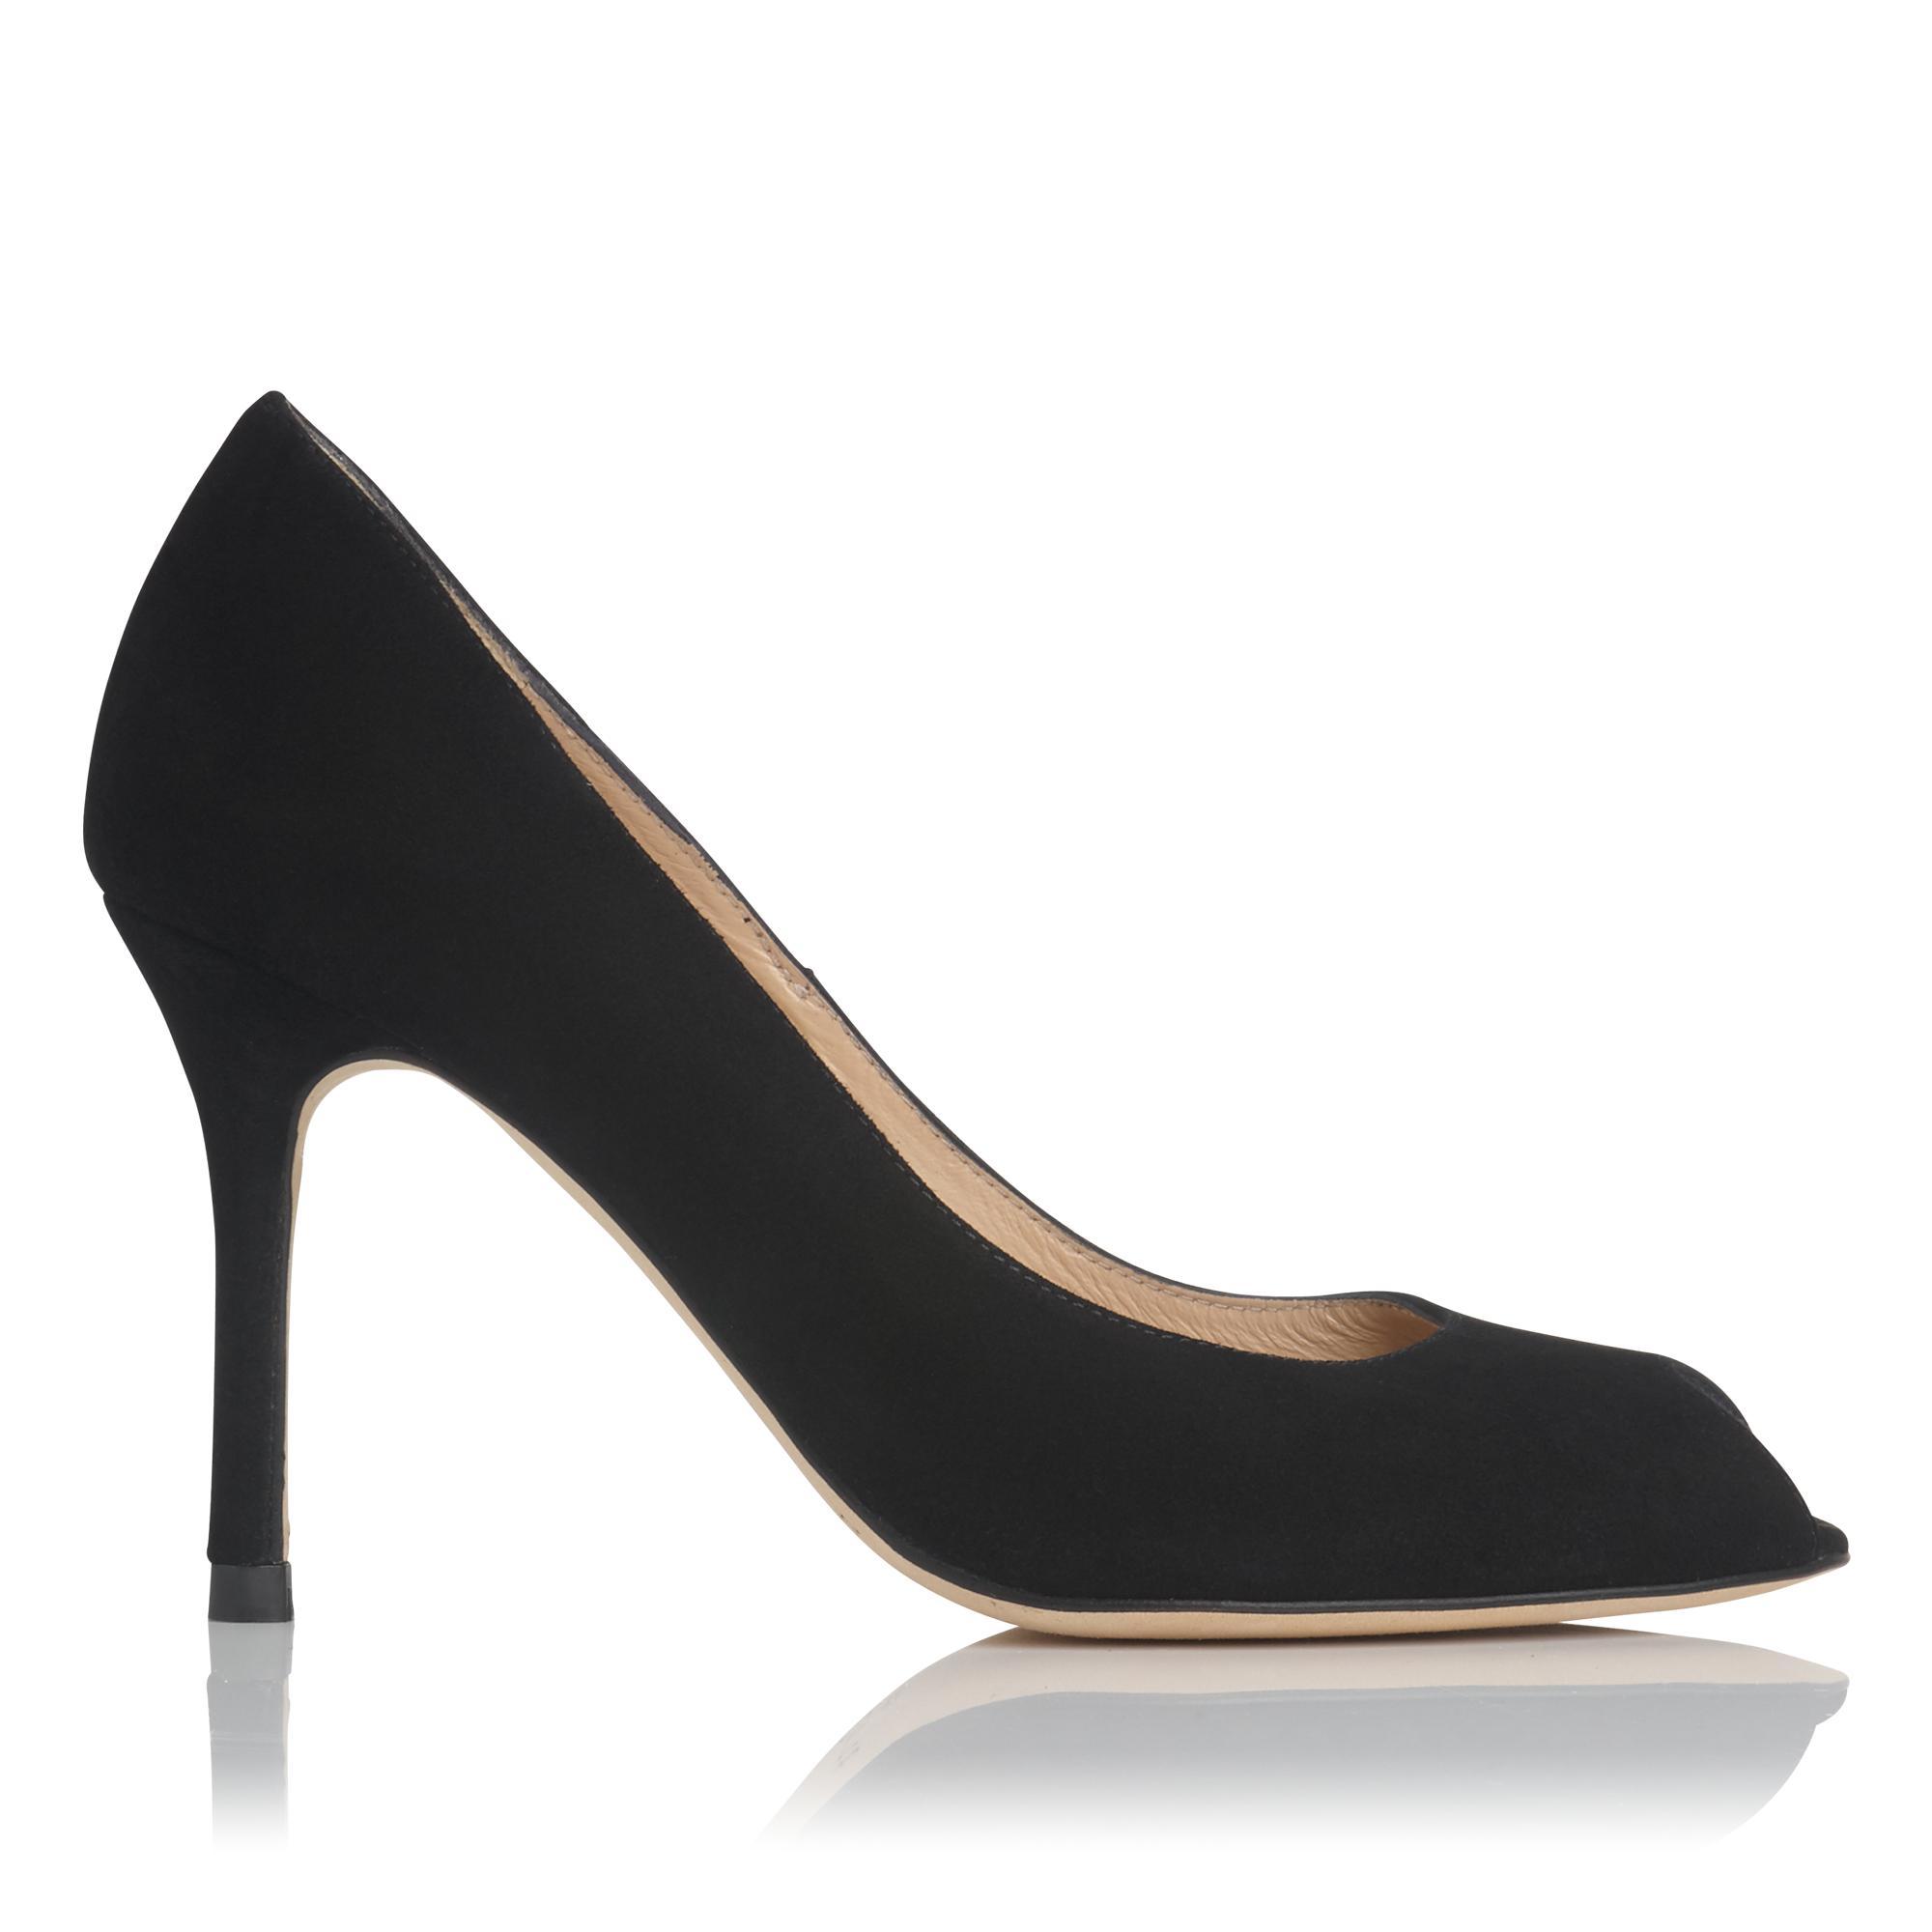 Margo Black Suede Peep Toe Heel